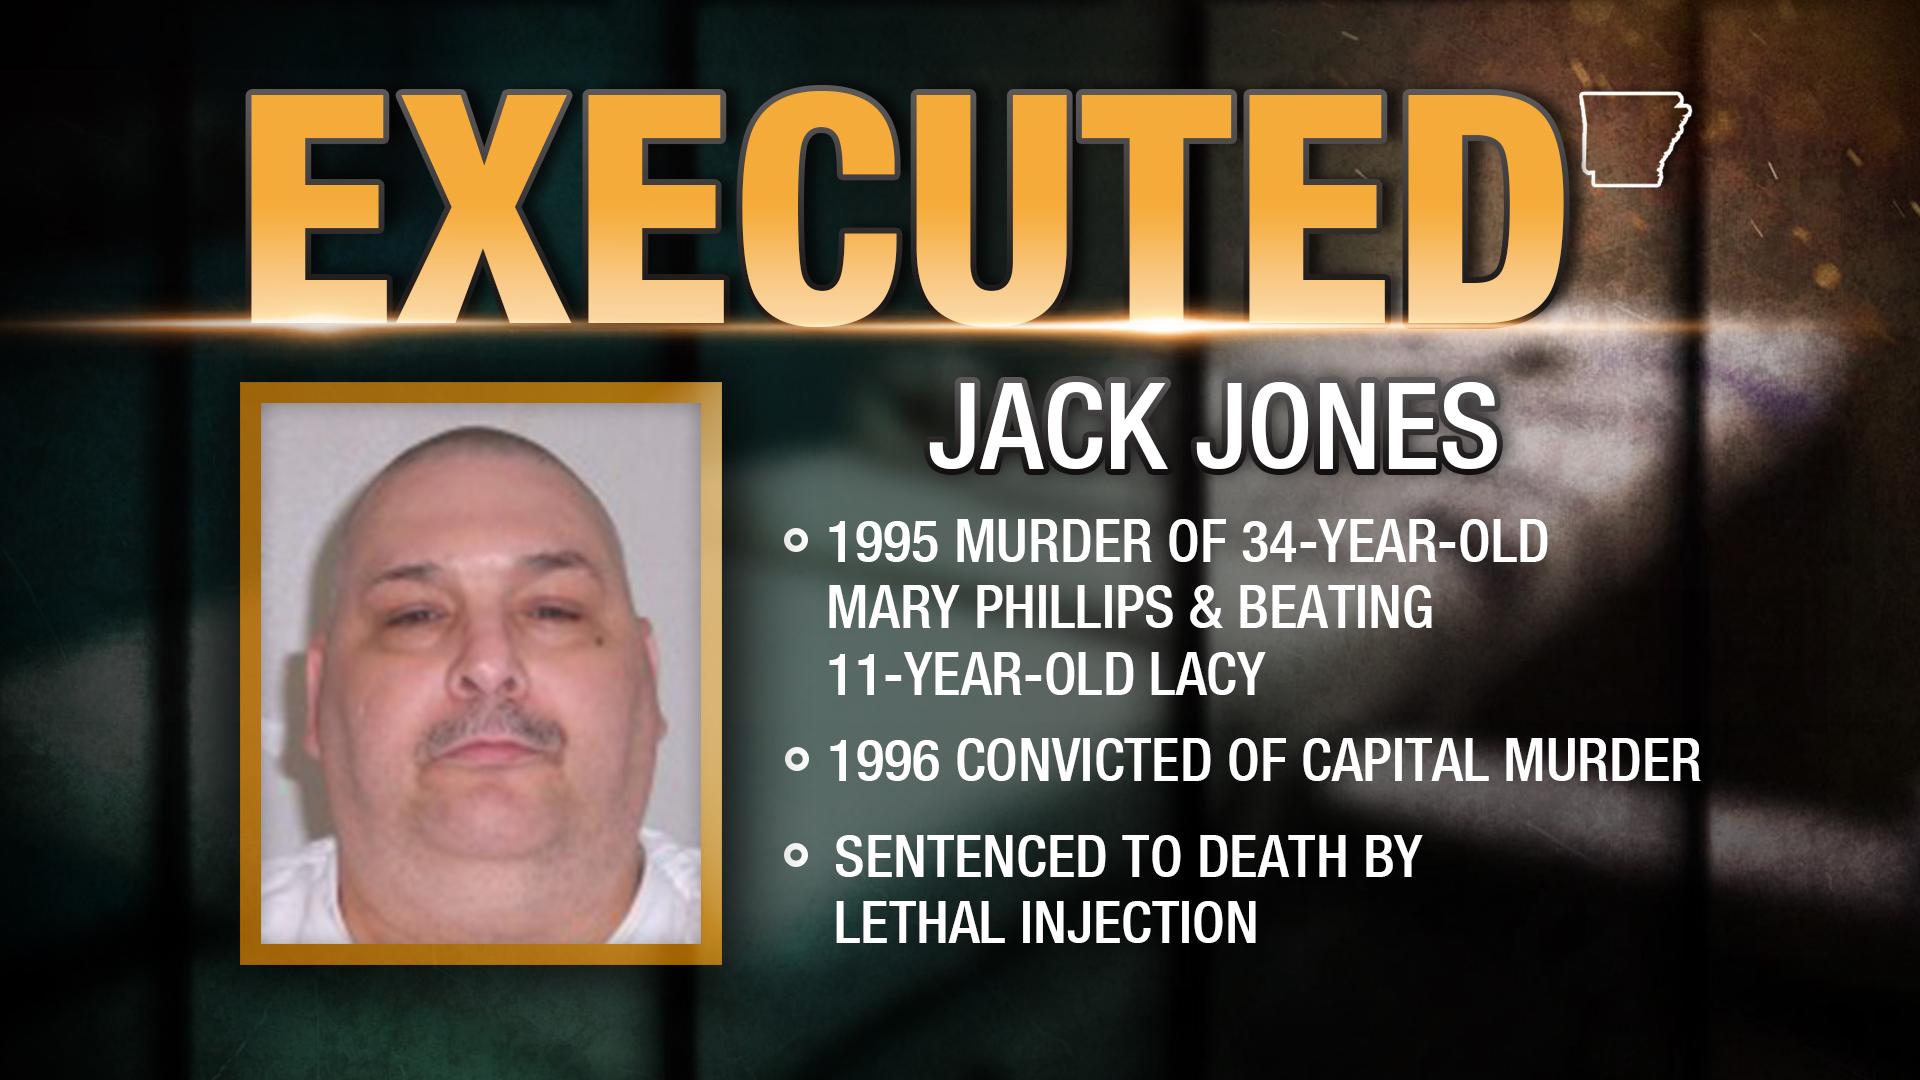 Arkansas Executes Death Row Inmate Jack Jones